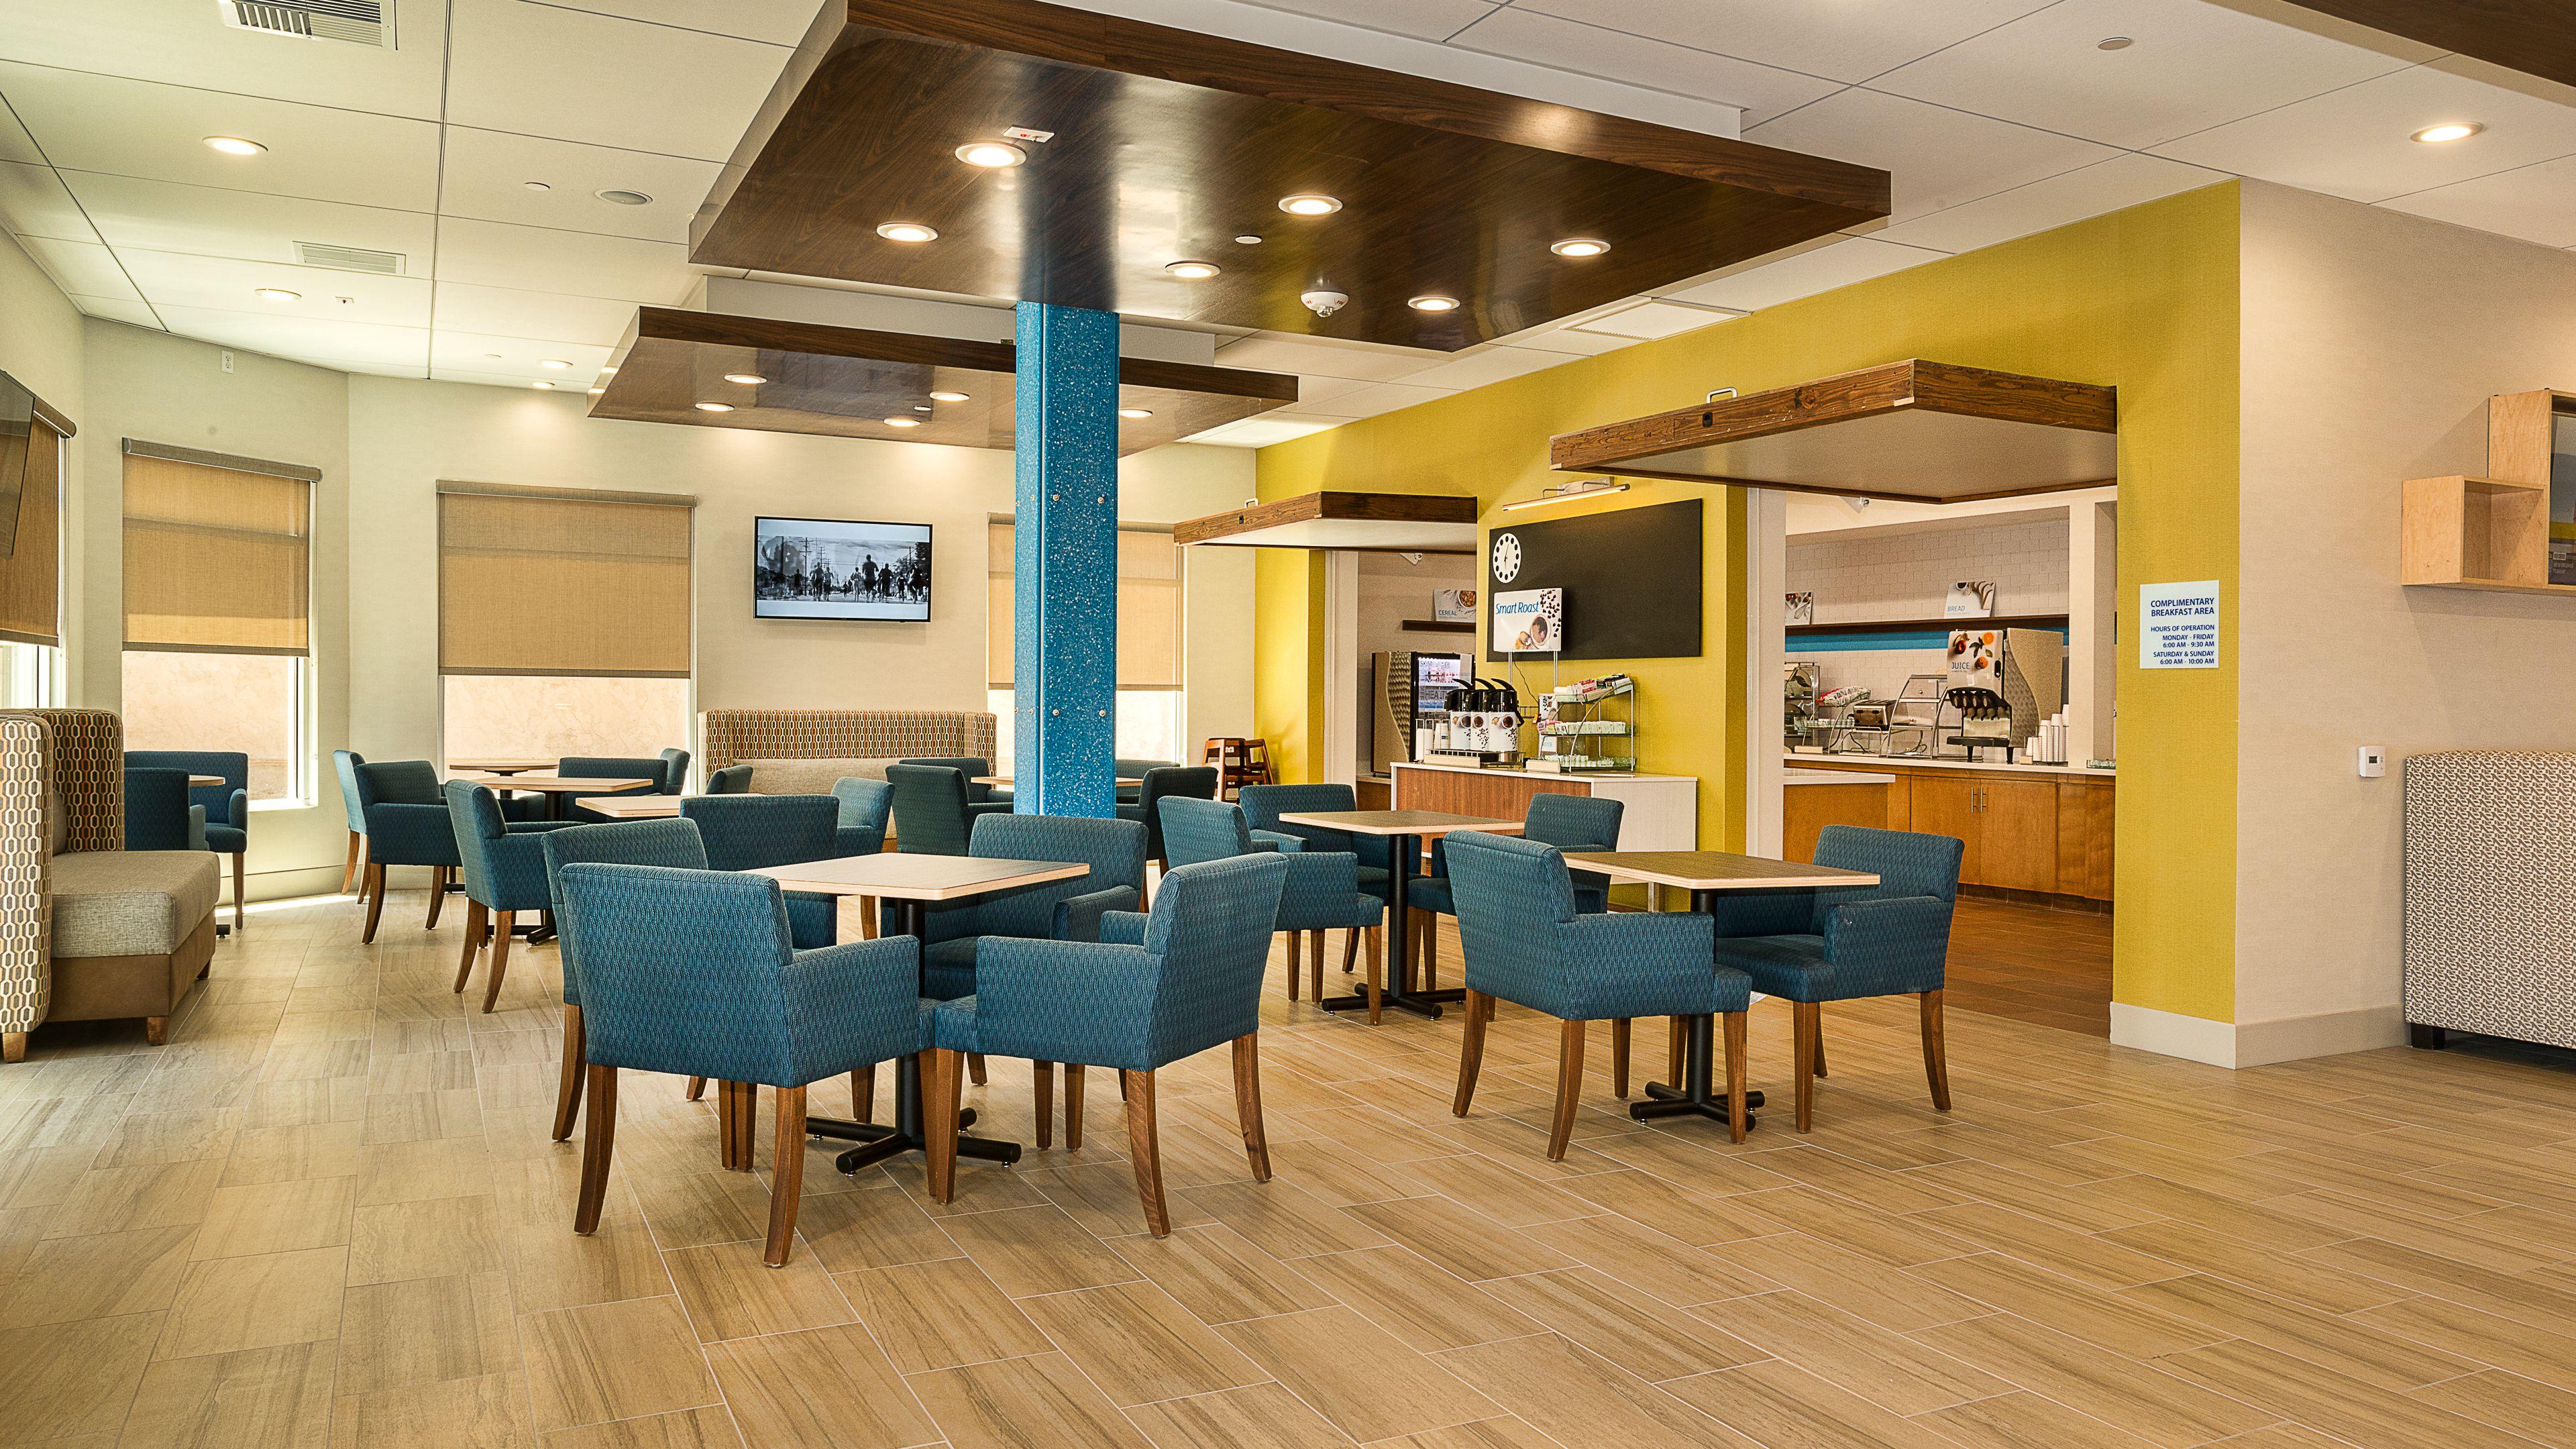 hotels motels in fullerton ca fullerton california. Black Bedroom Furniture Sets. Home Design Ideas